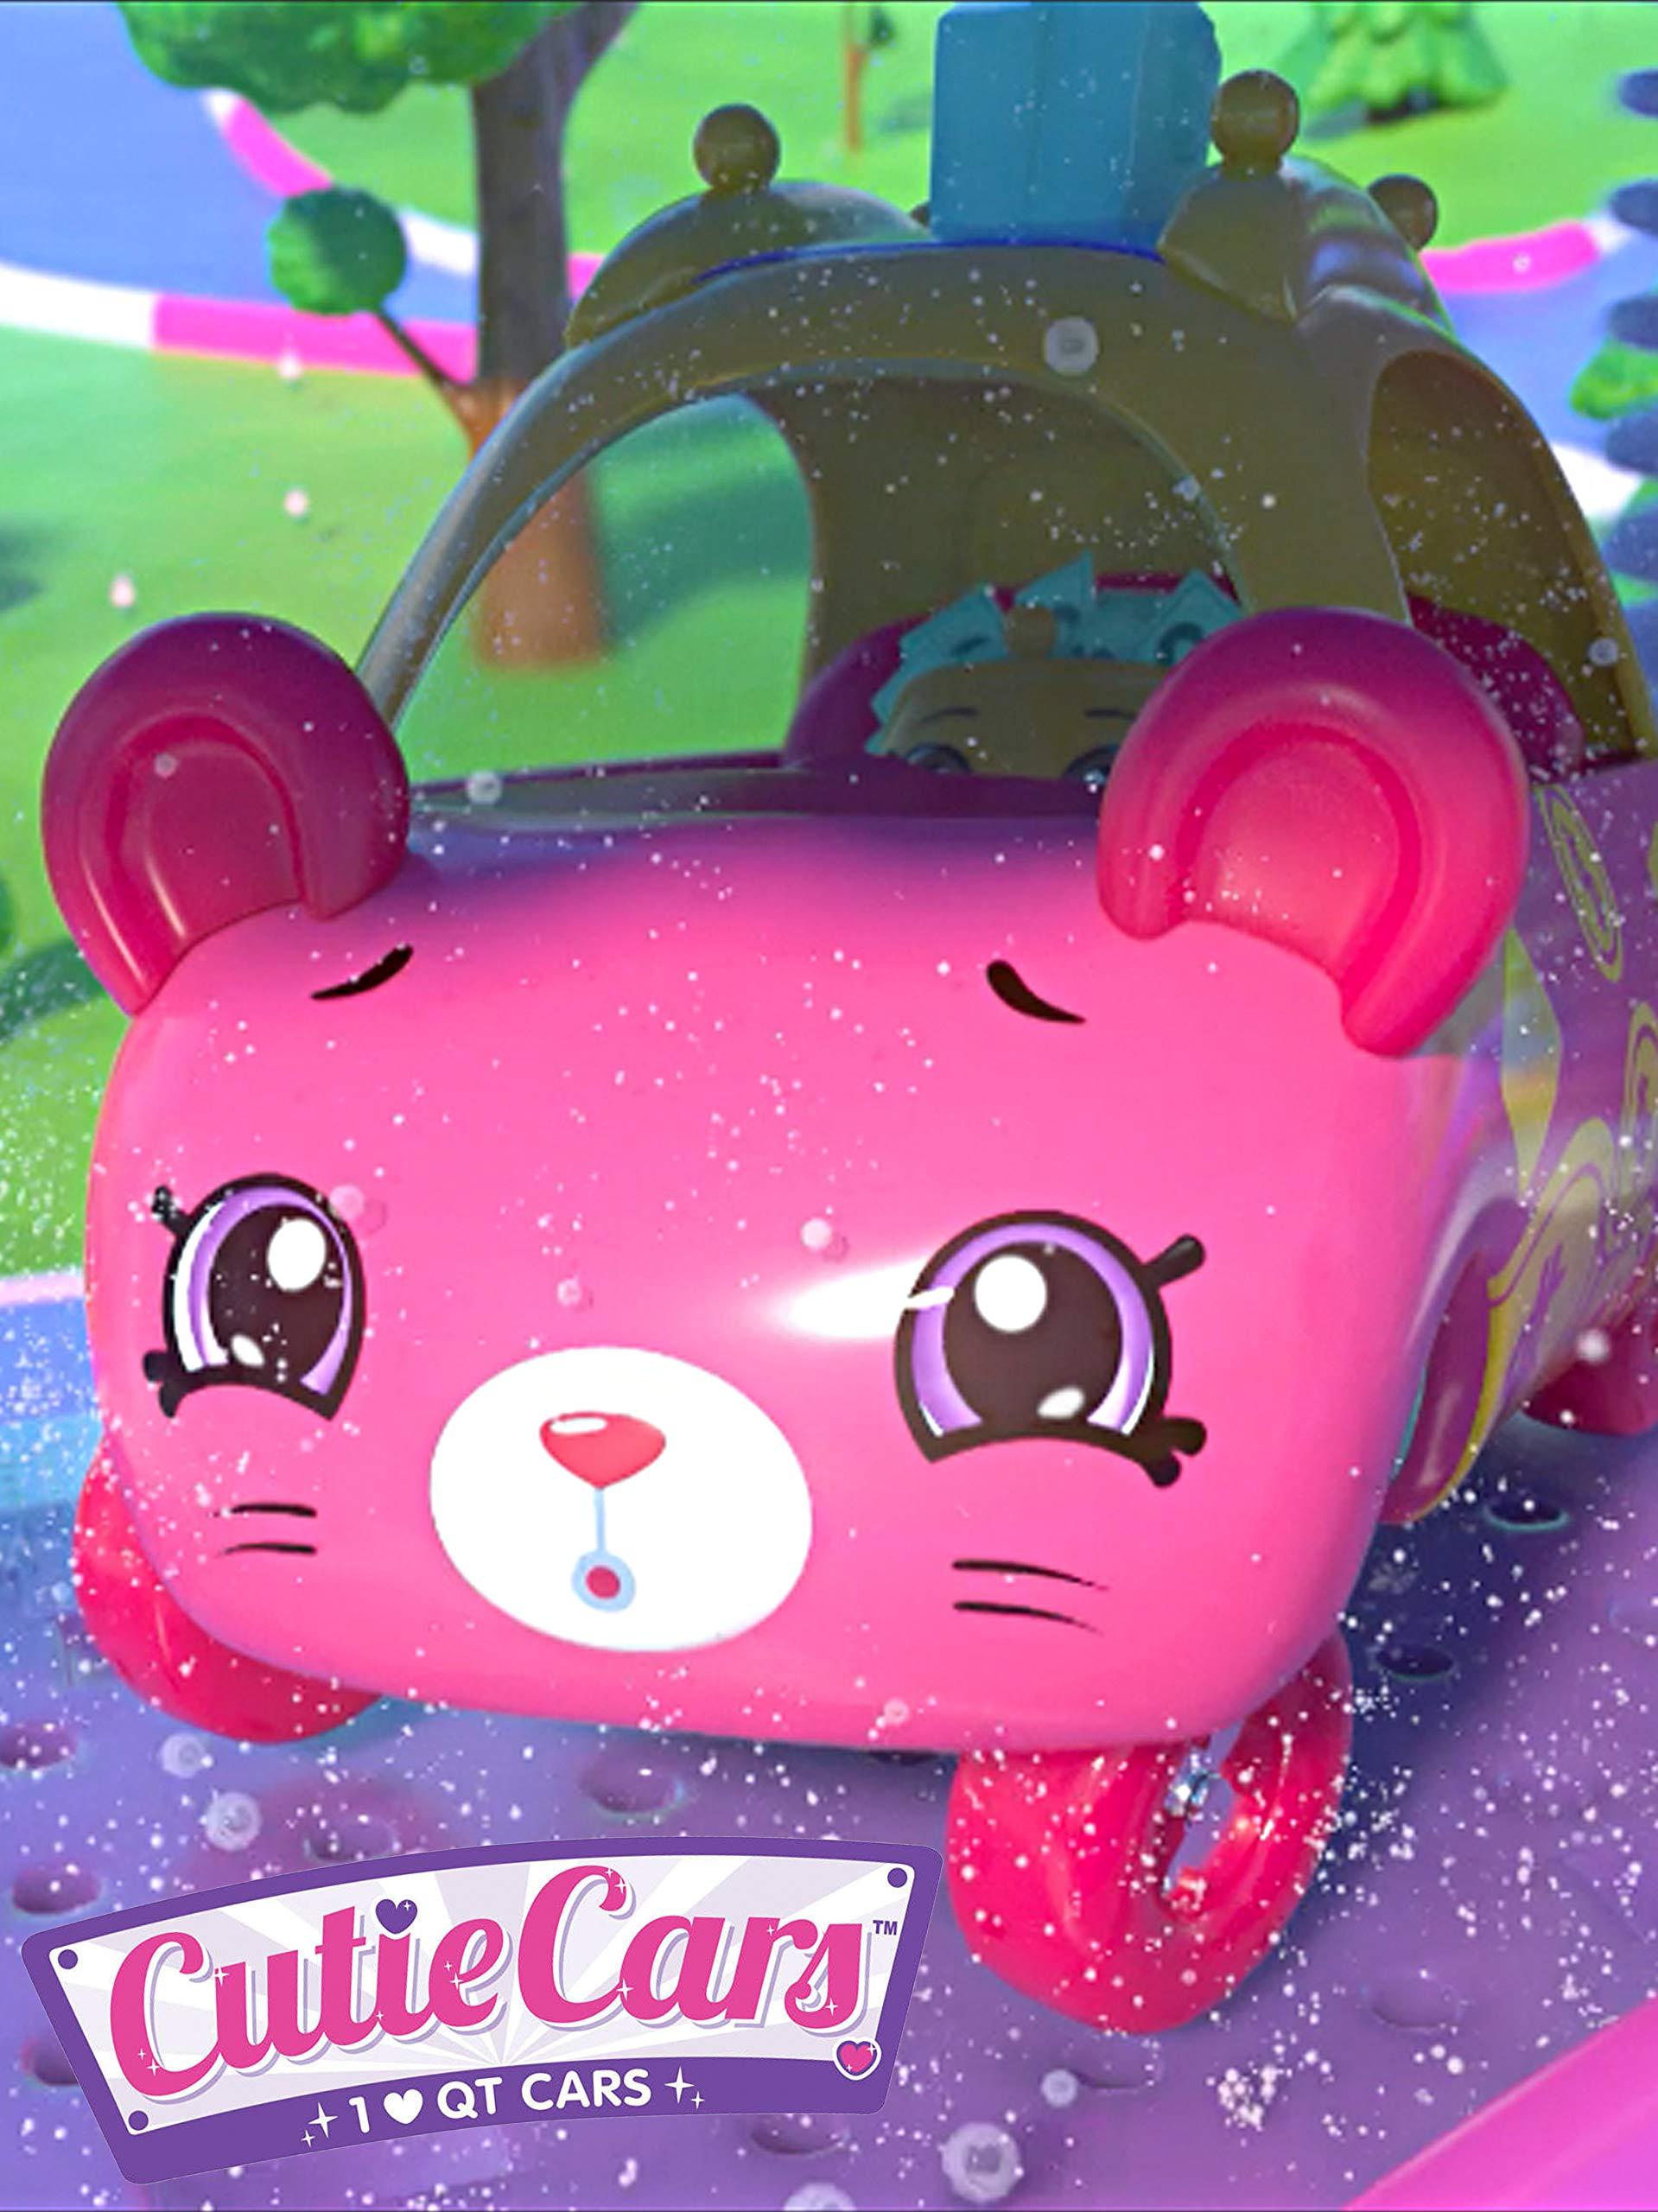 Cutie Cars Car Wash Dance & Music Video on Amazon Prime Video UK